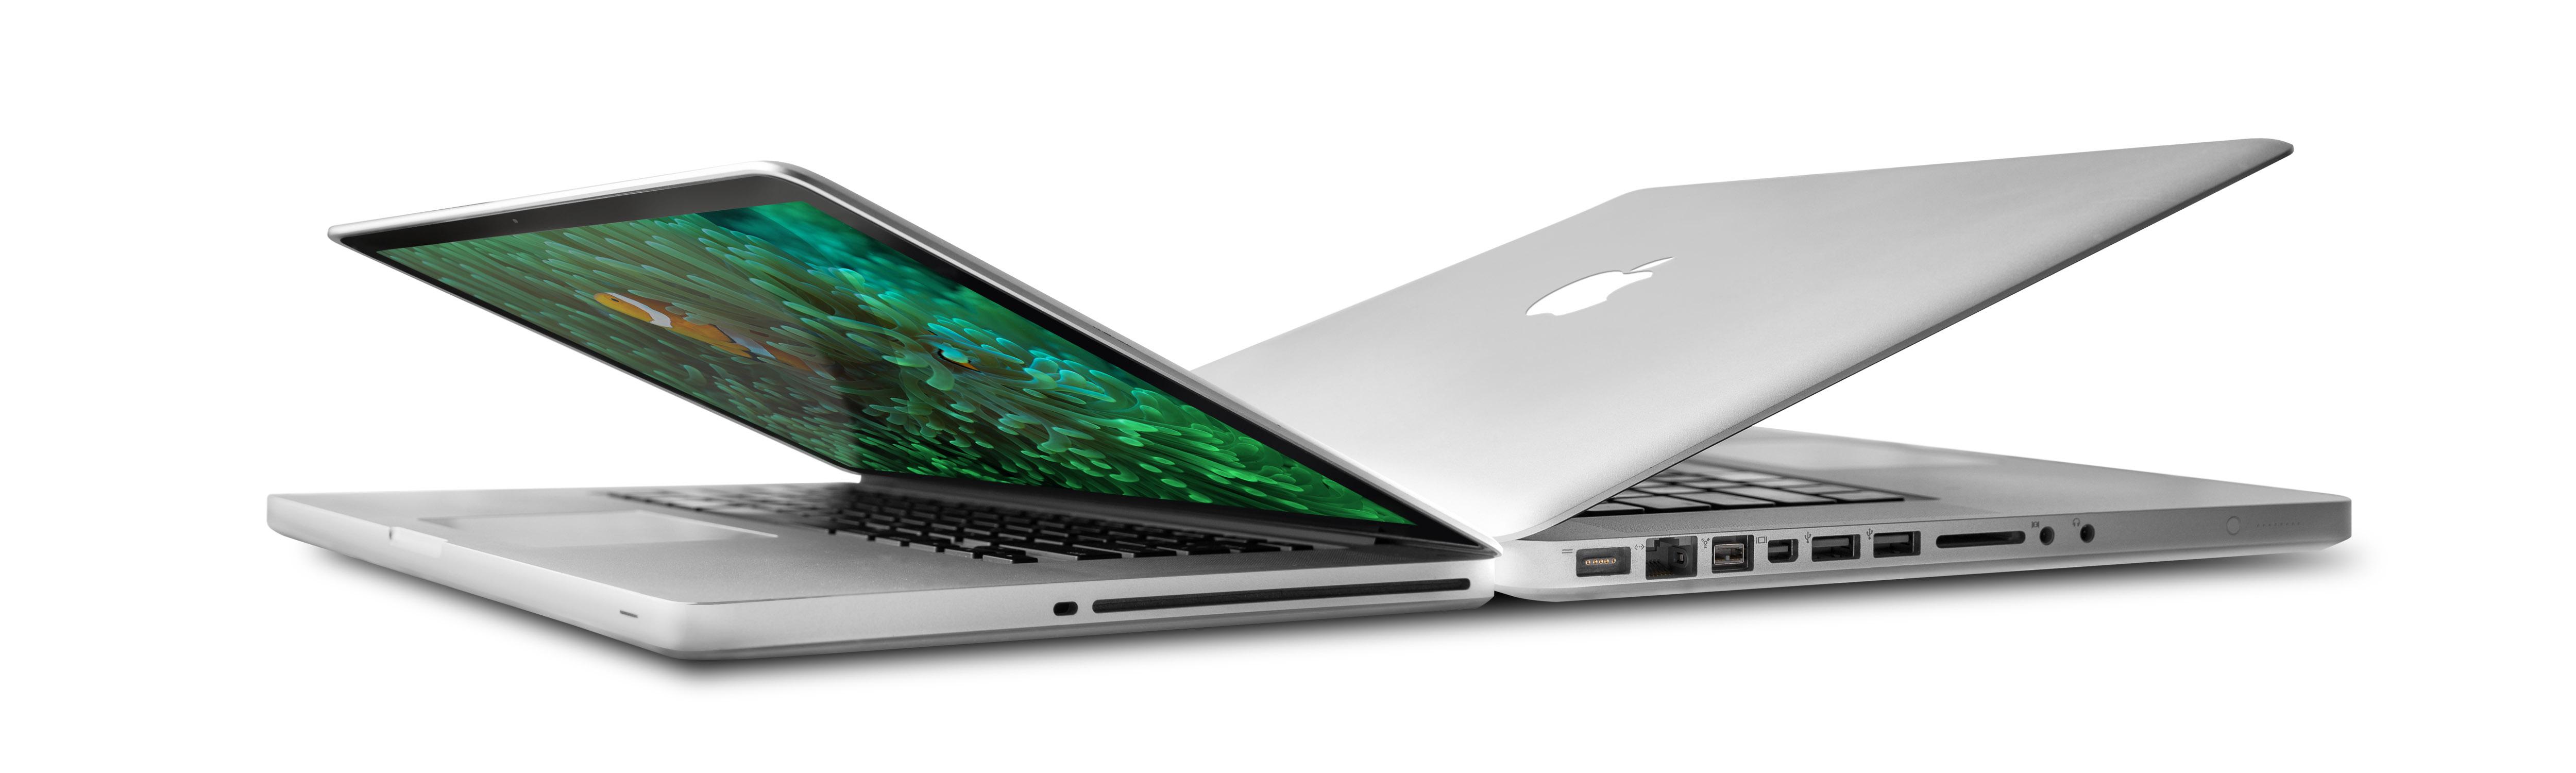 Apple Mac Book Pro - Apple Support Hamburg